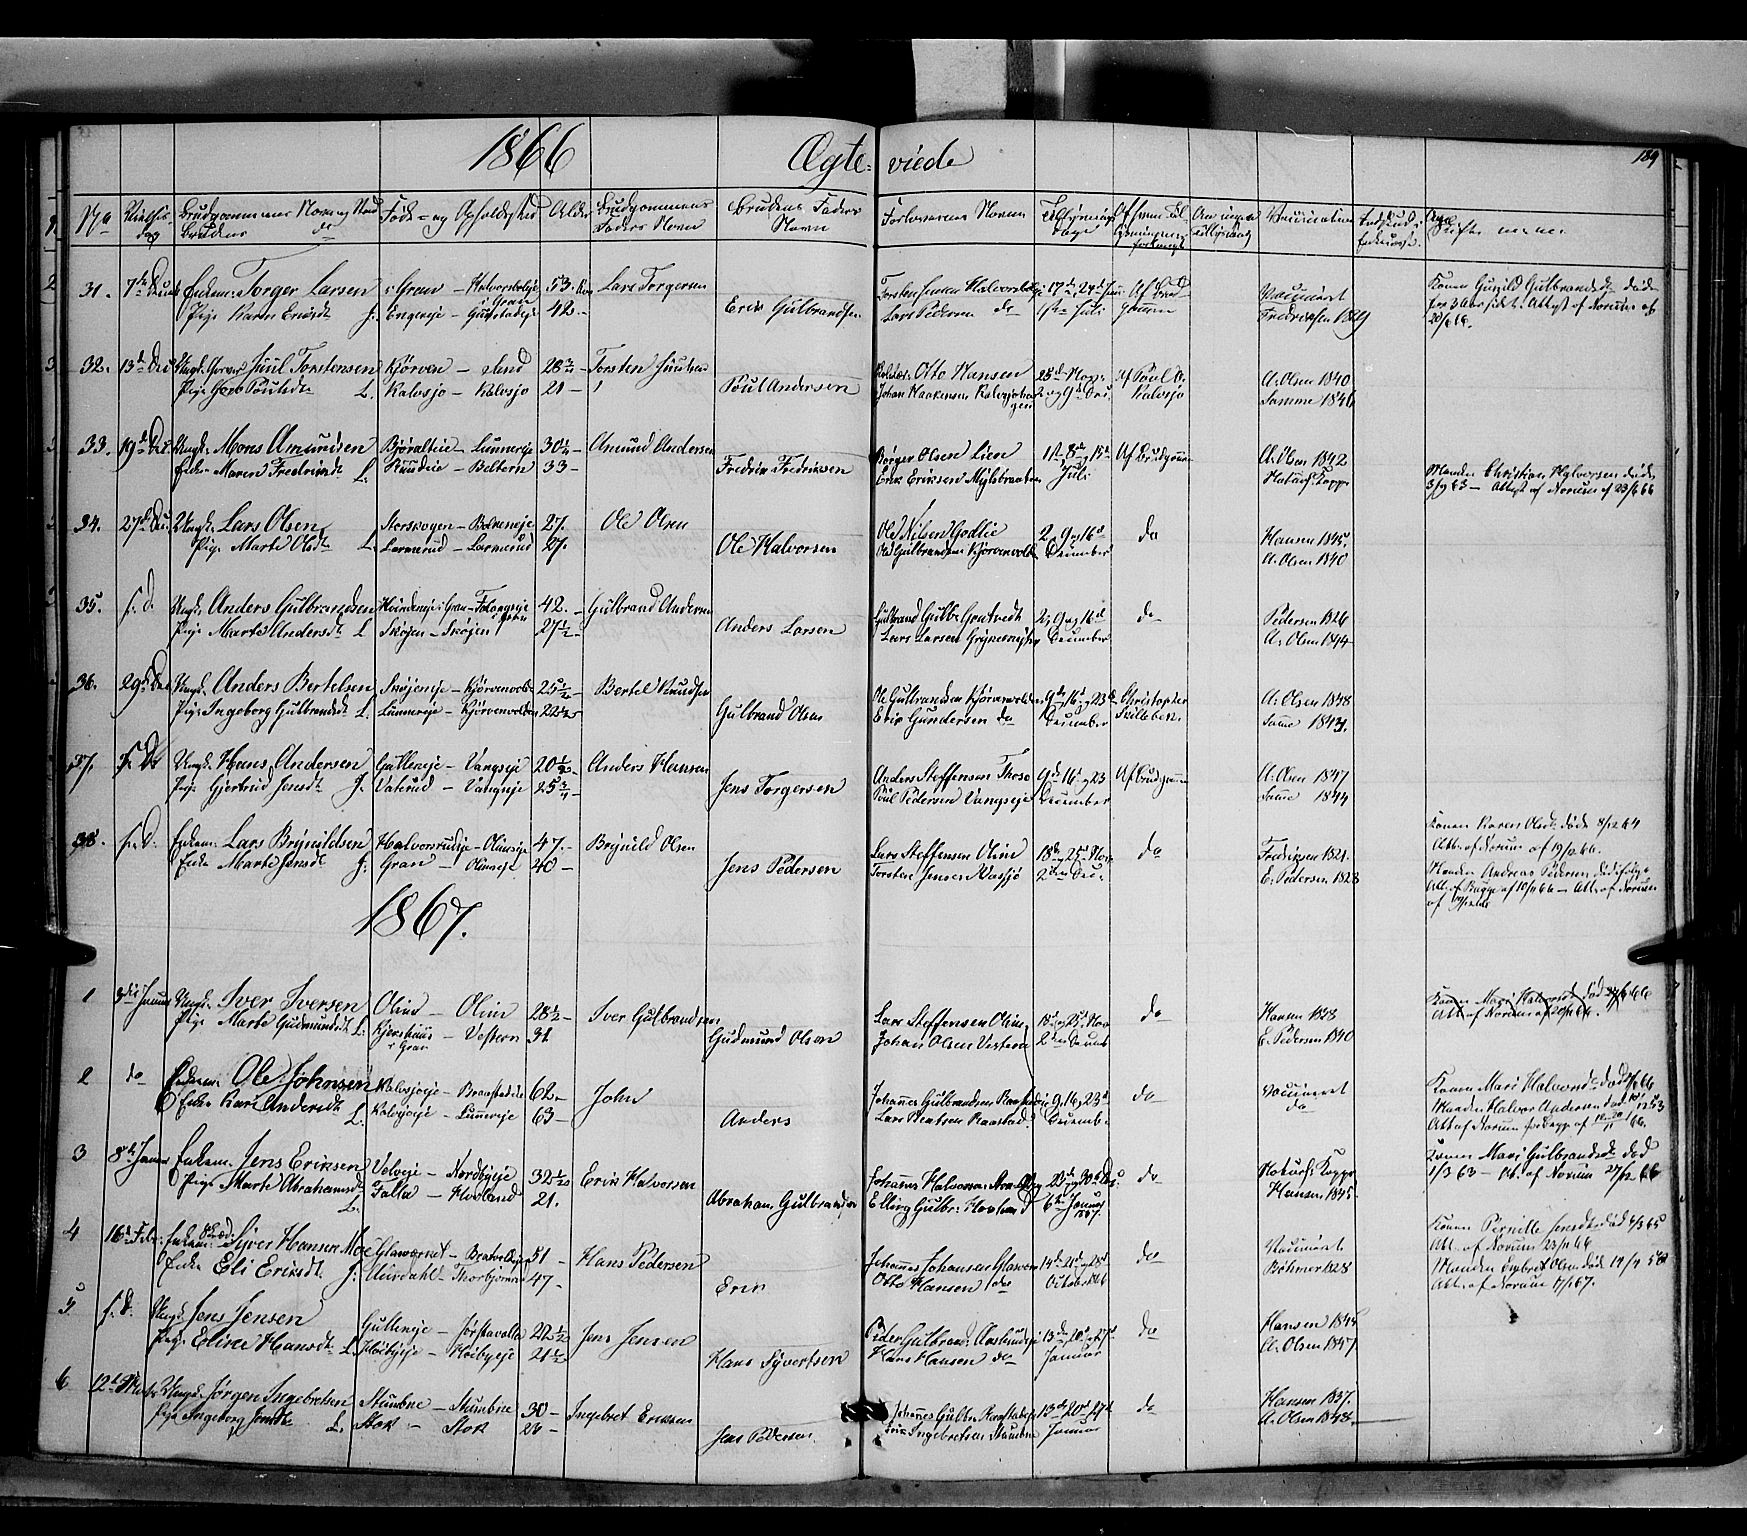 SAH, Jevnaker prestekontor, Ministerialbok nr. 7, 1858-1876, s. 189